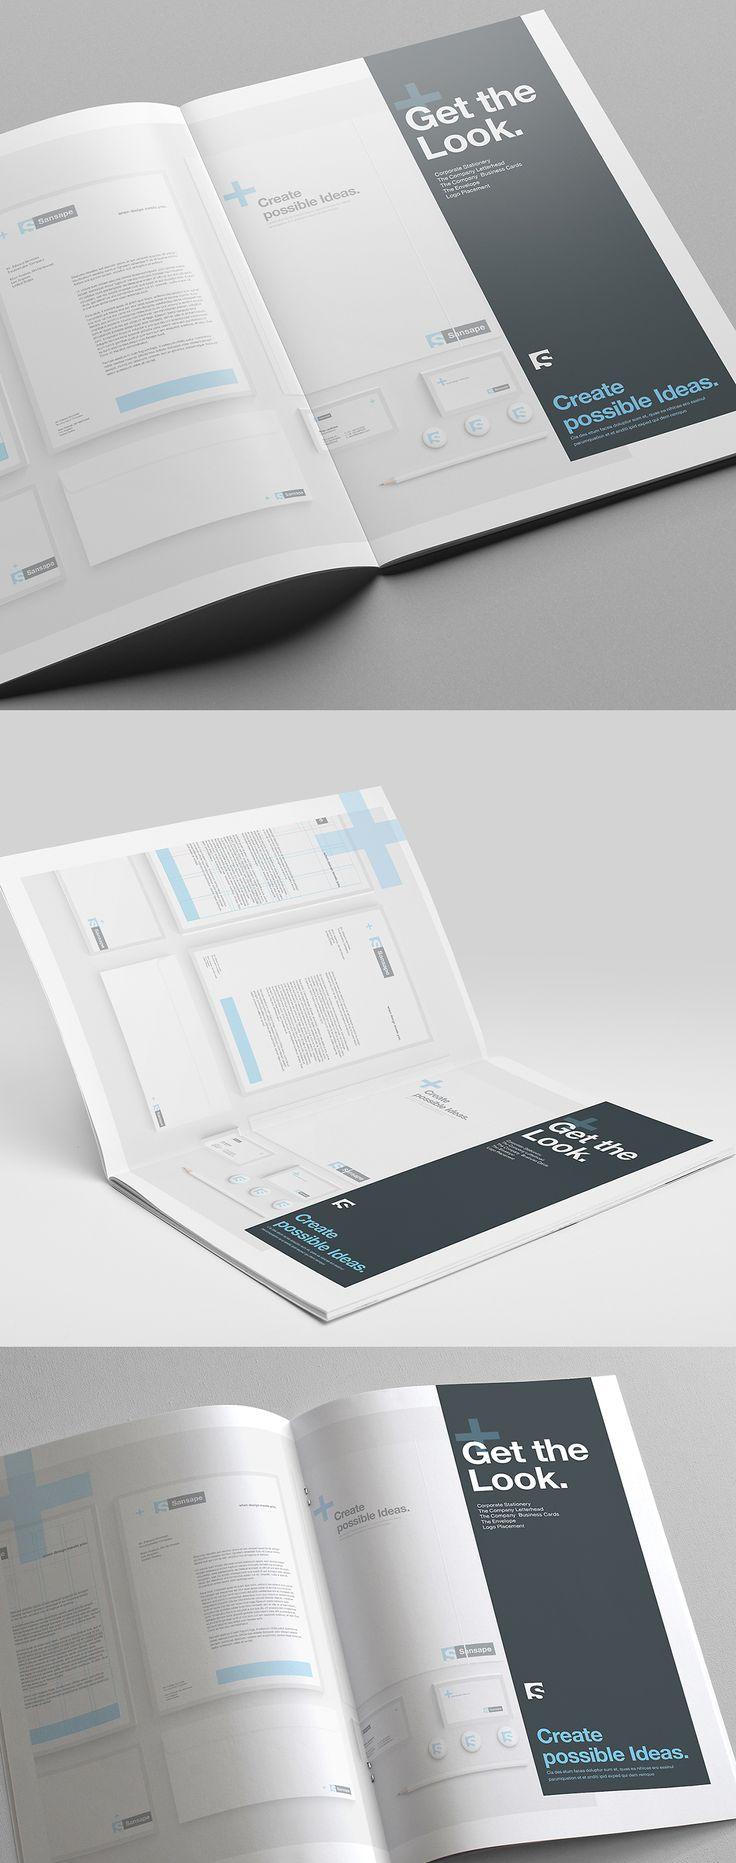 Brand Manual on Behance